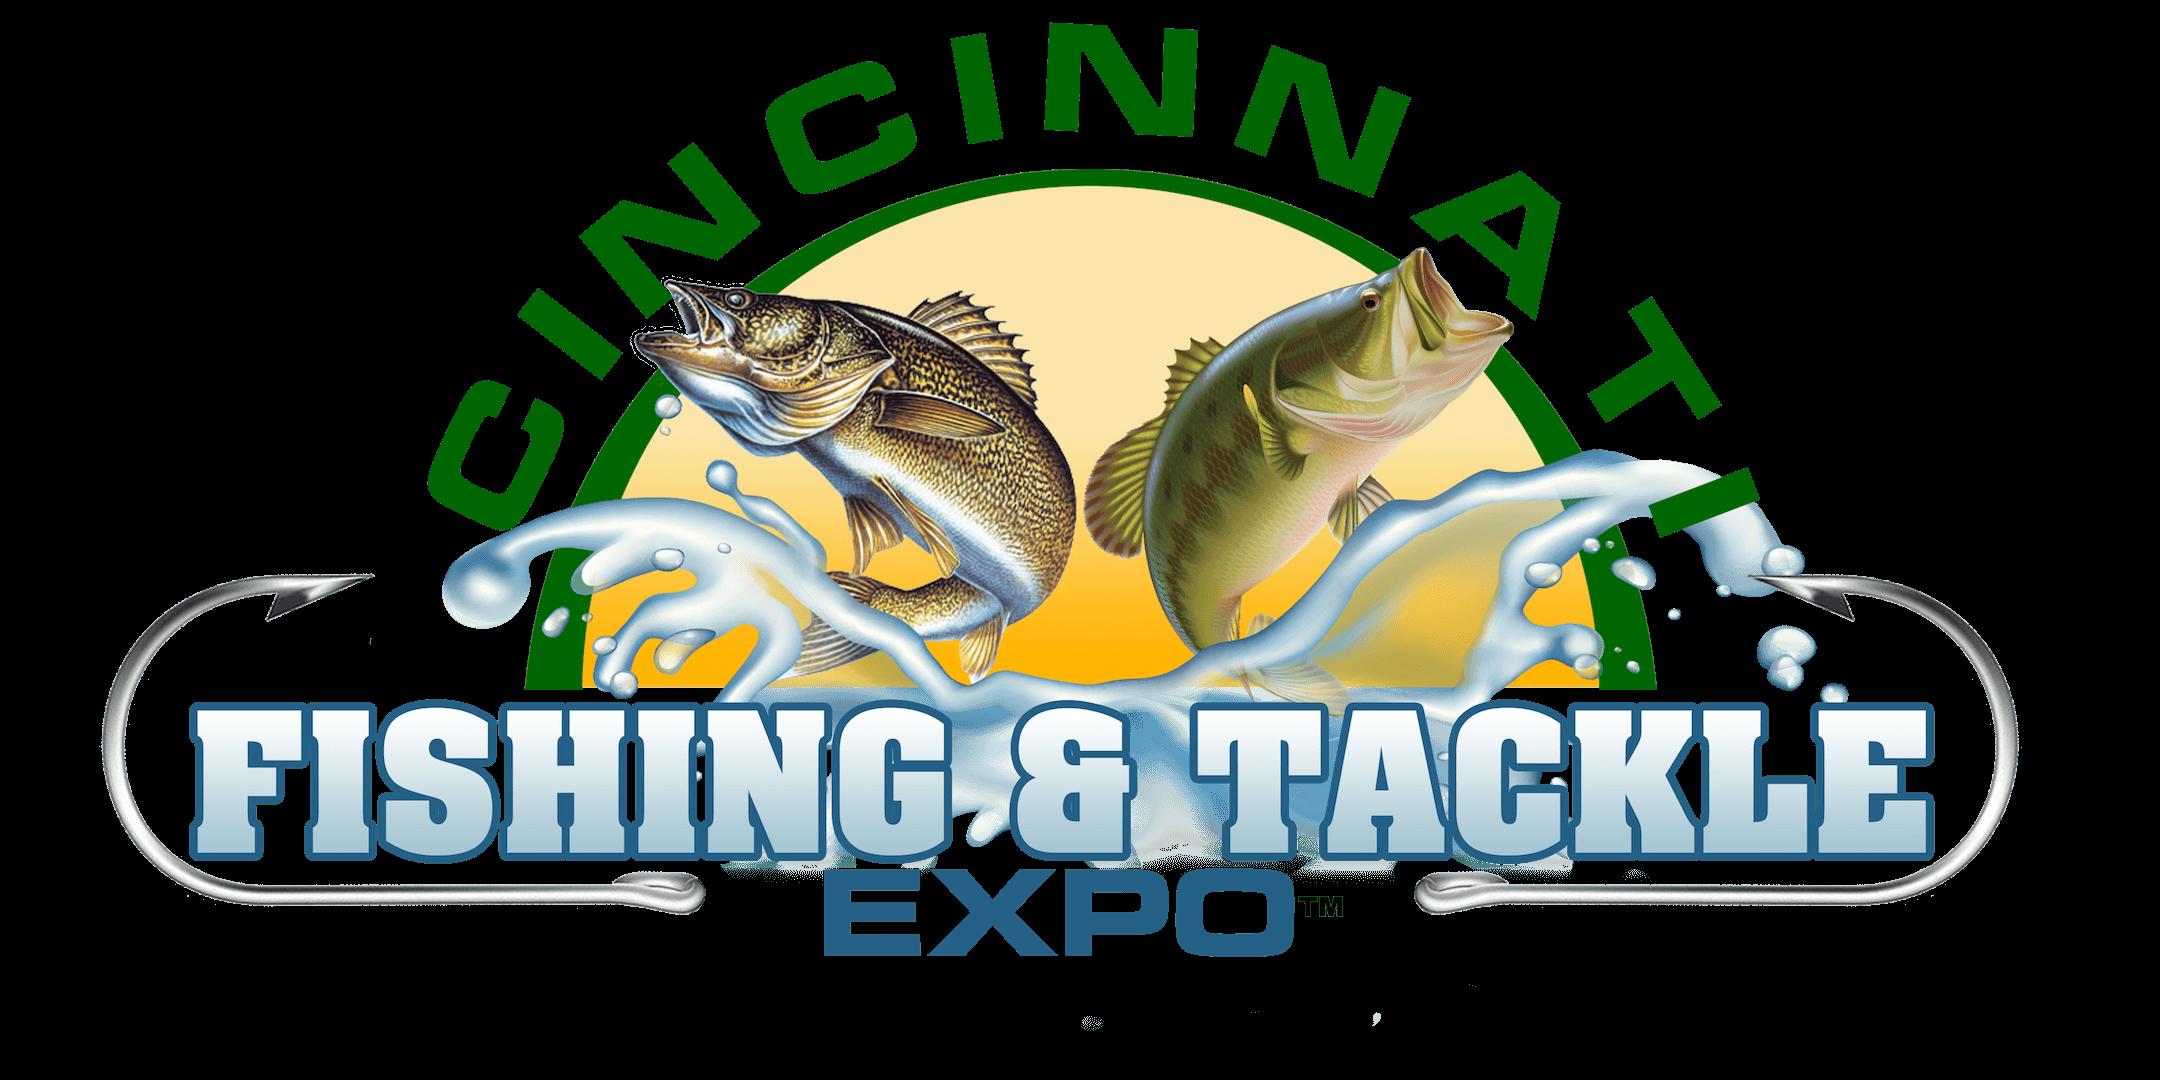 cincinnati fishing and tackle expo